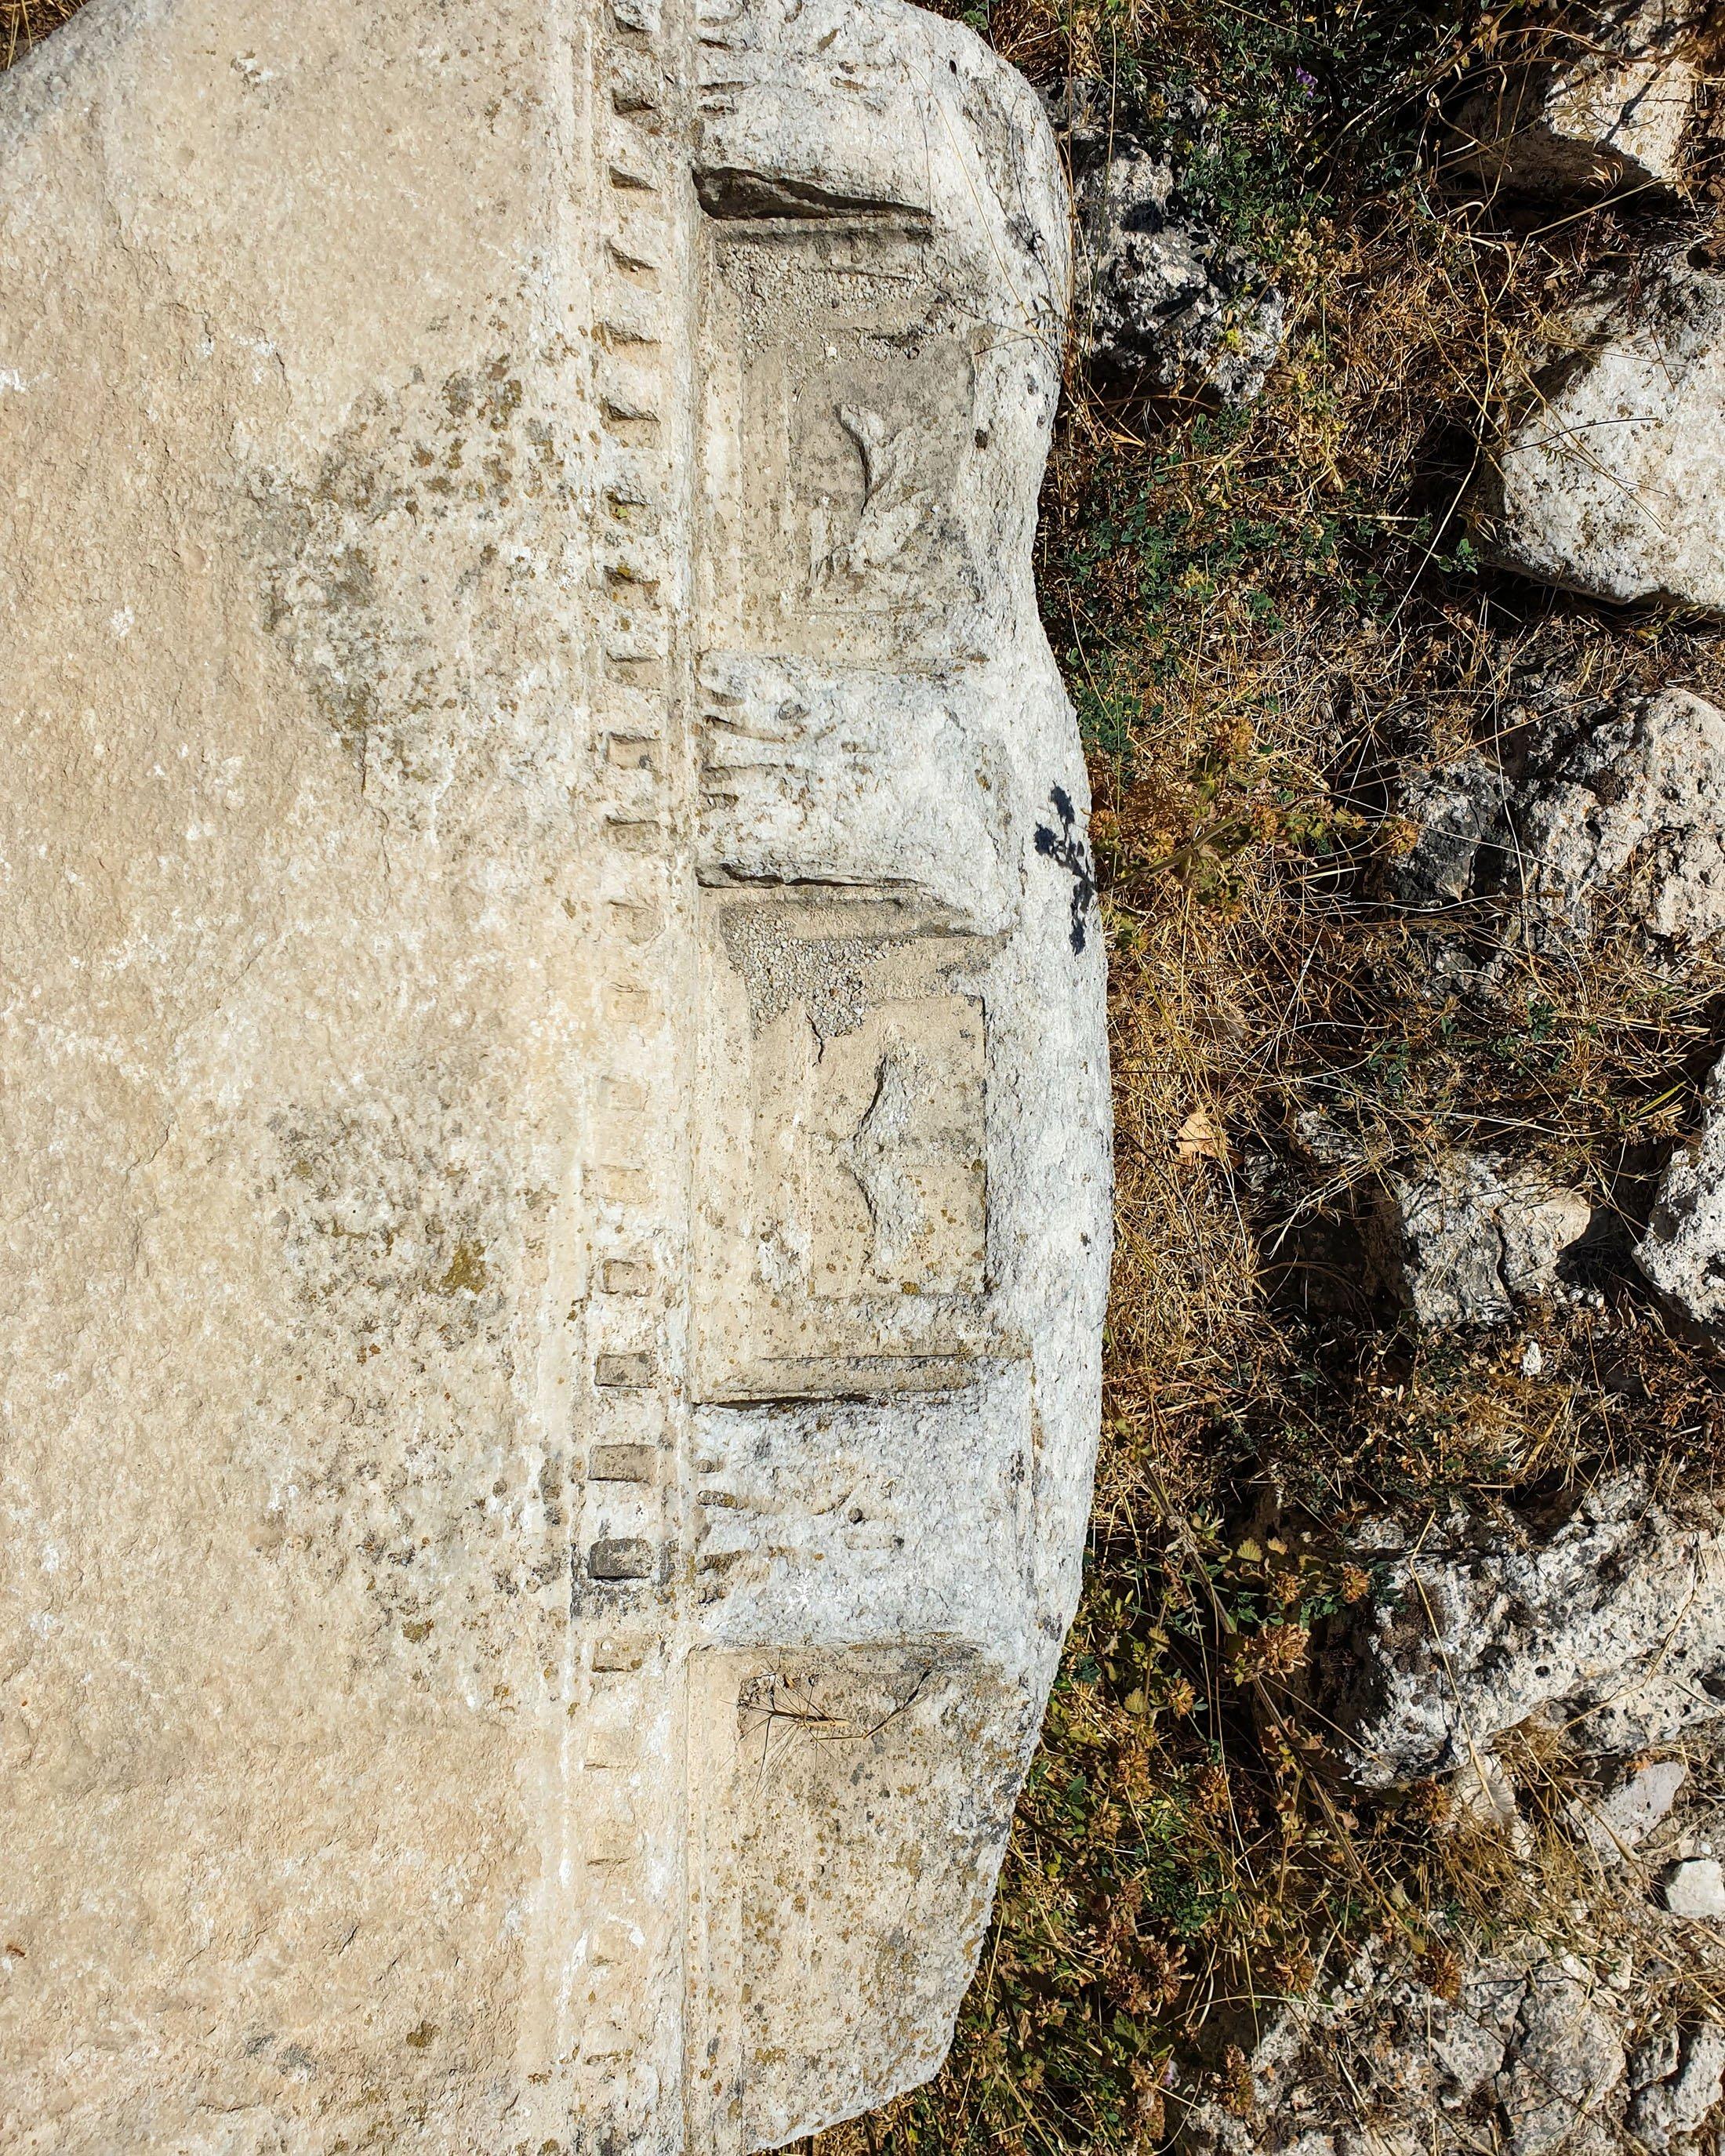 Architectural fragments in Agora at Pessinus. (Photo by Argun Konuk)